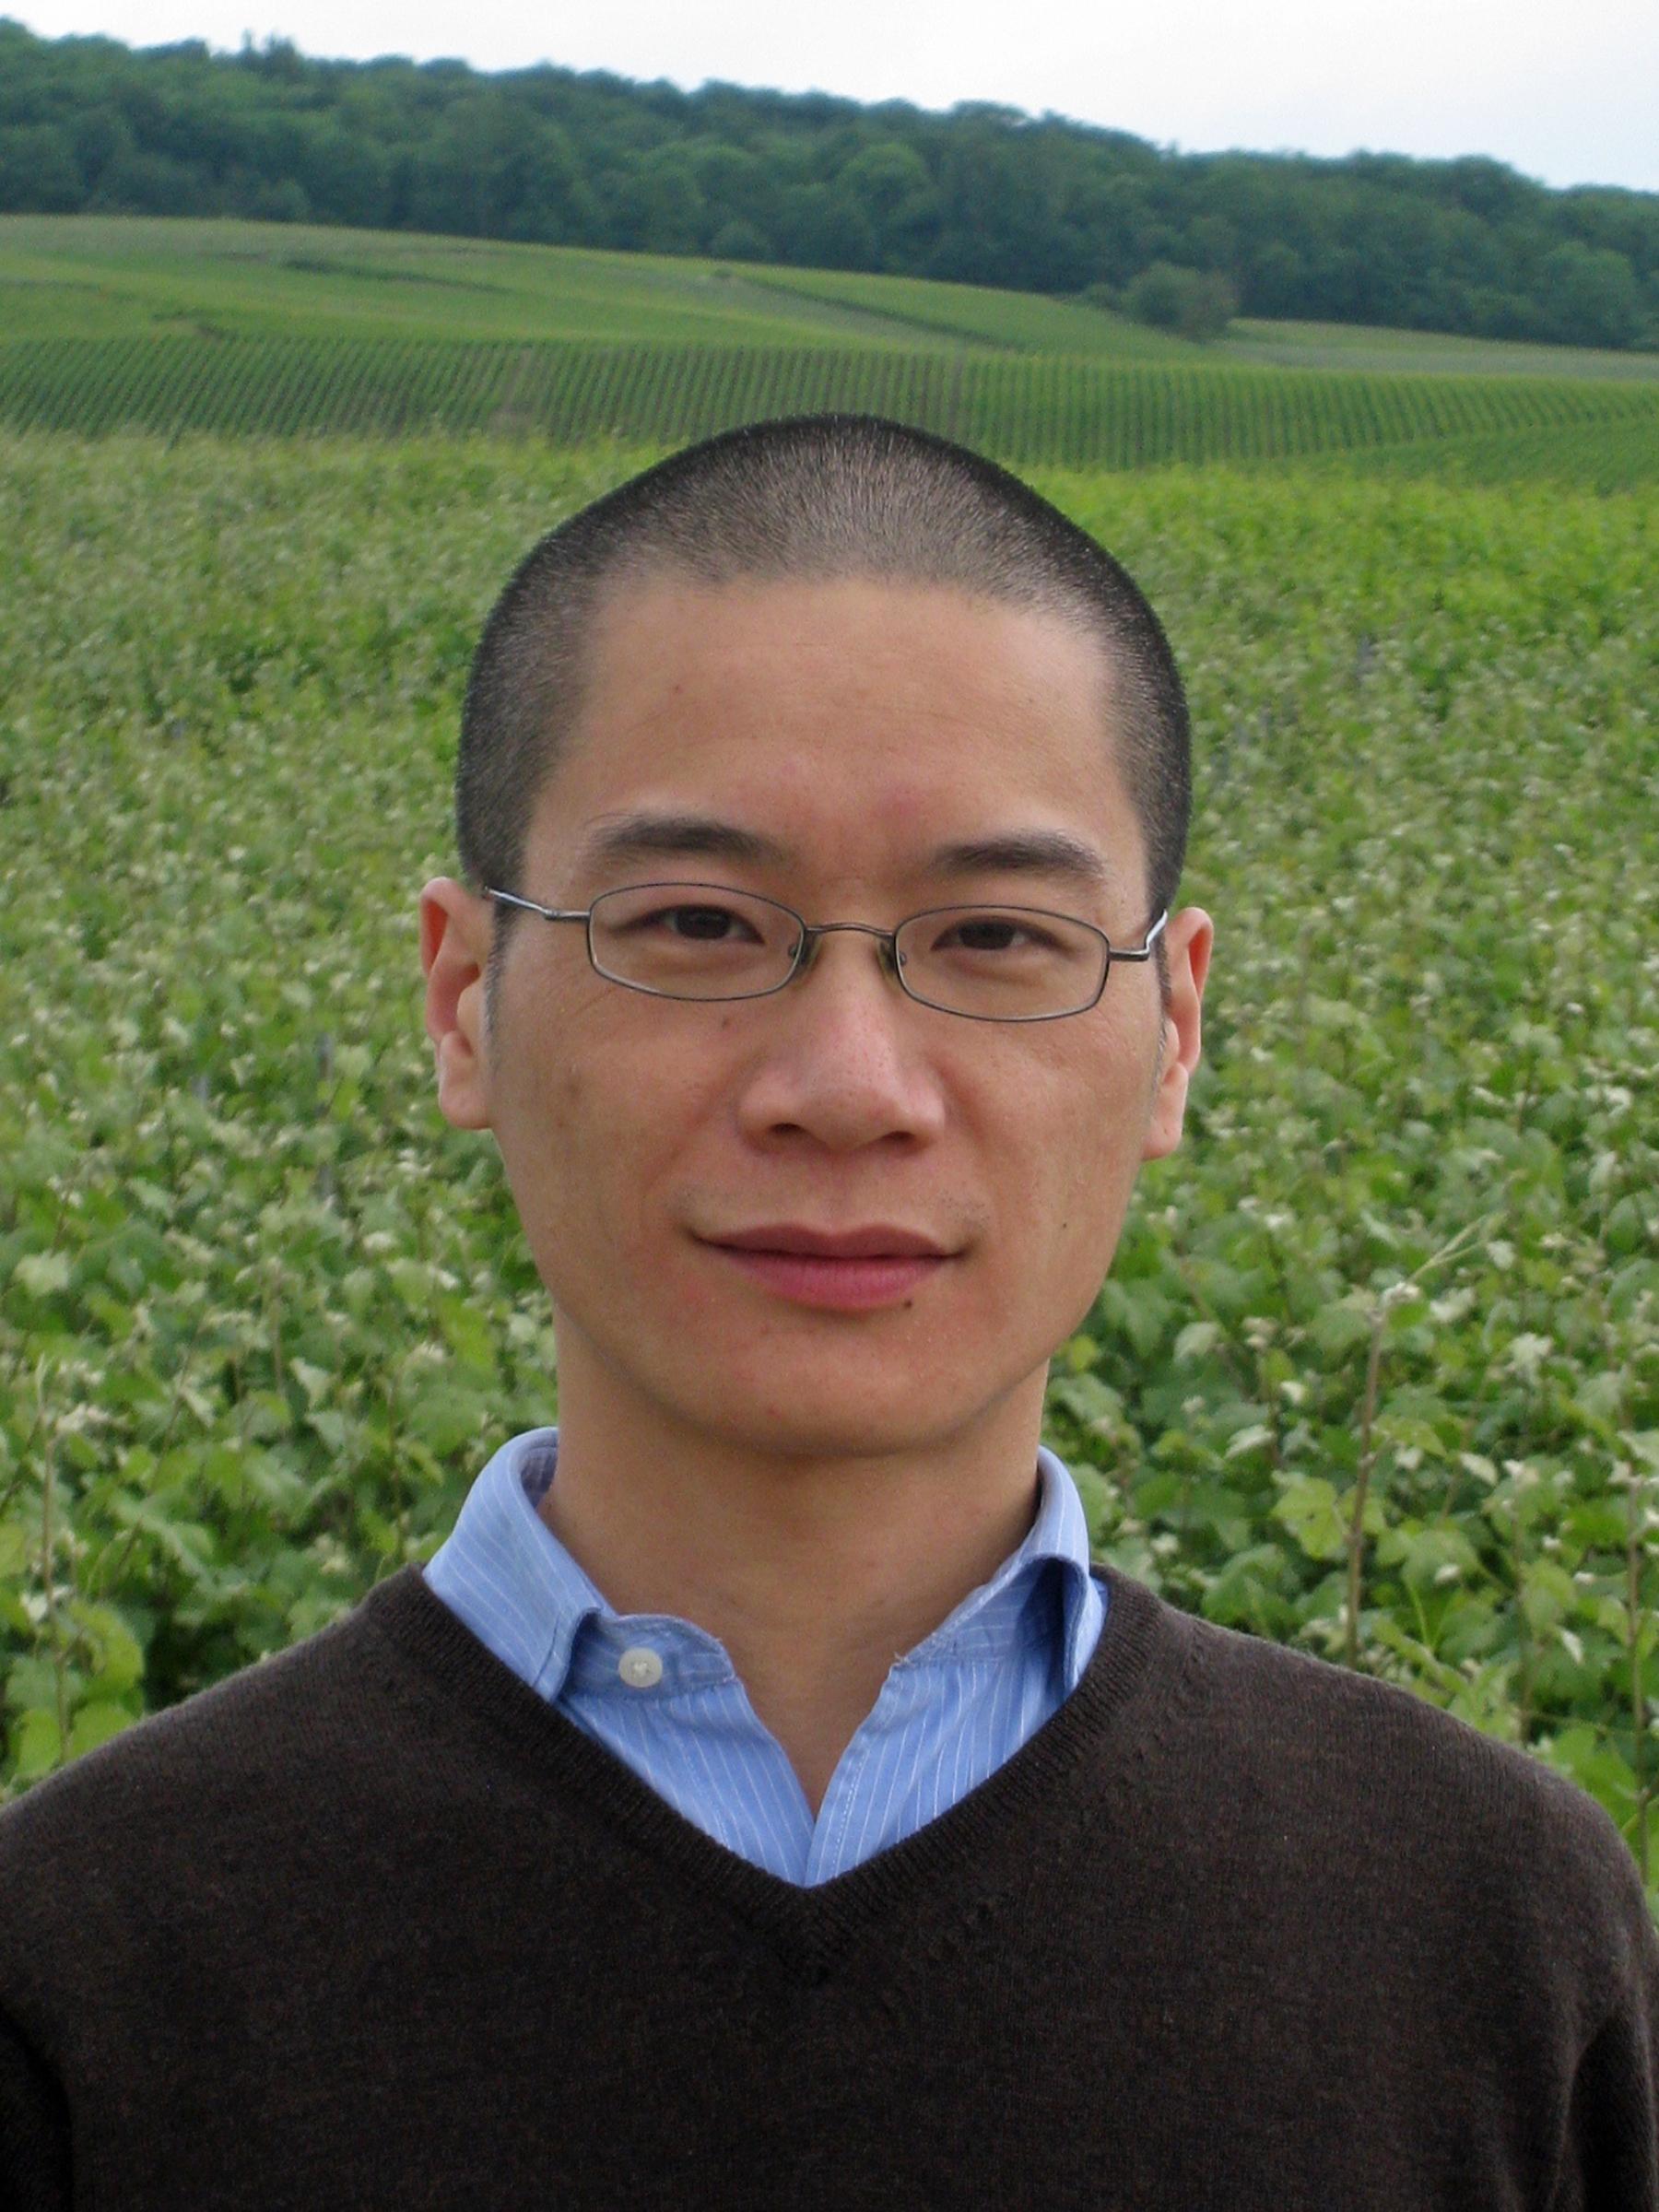 Sherryfest Co-Founder Peter Liem